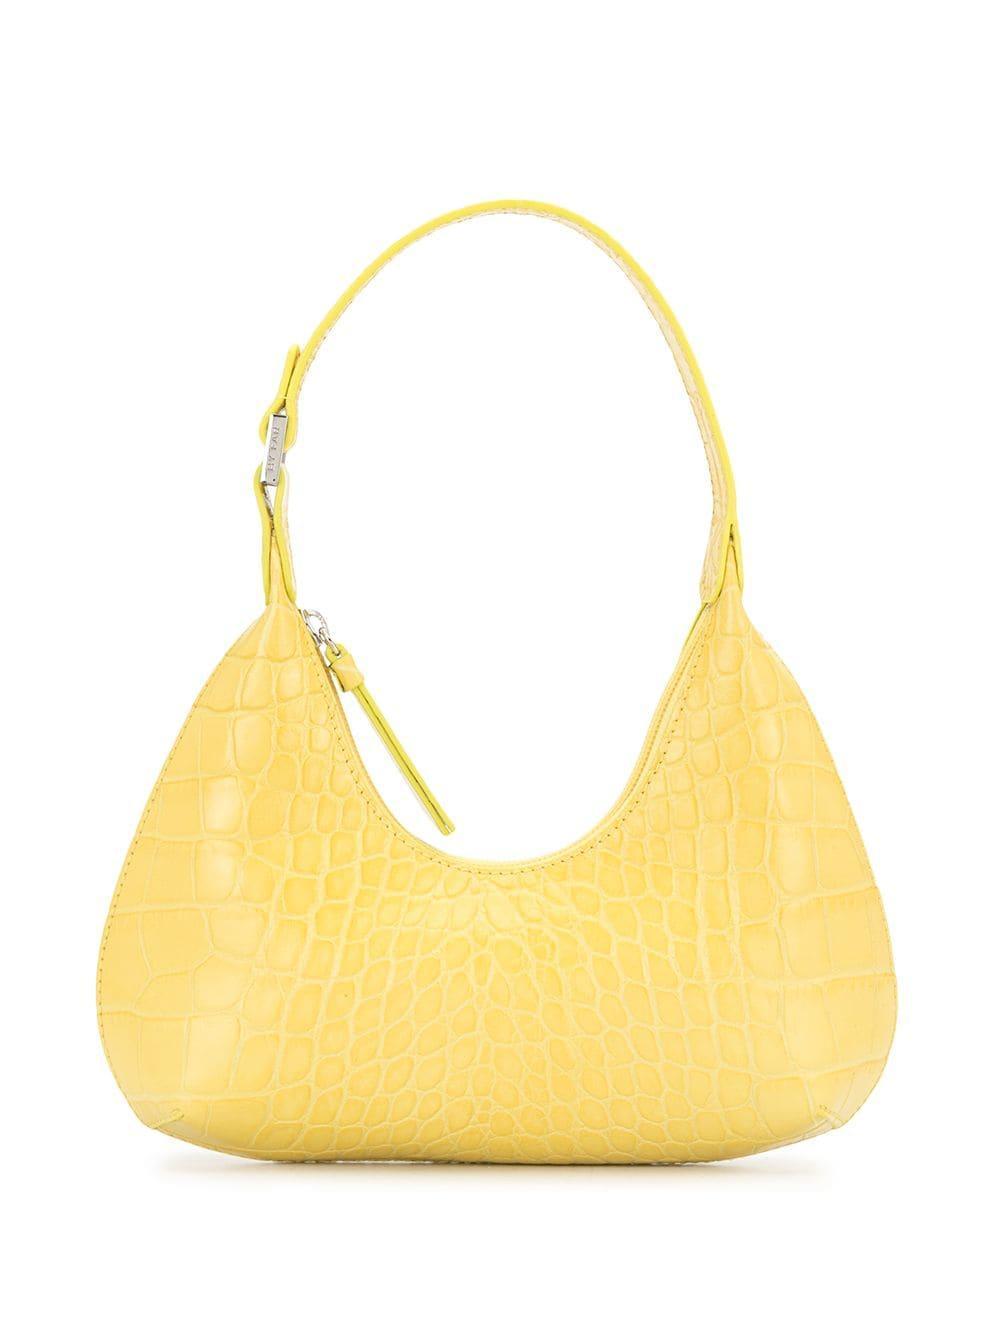 Baby Amber Croco Bag Item # 21CRBASCUSDSMA